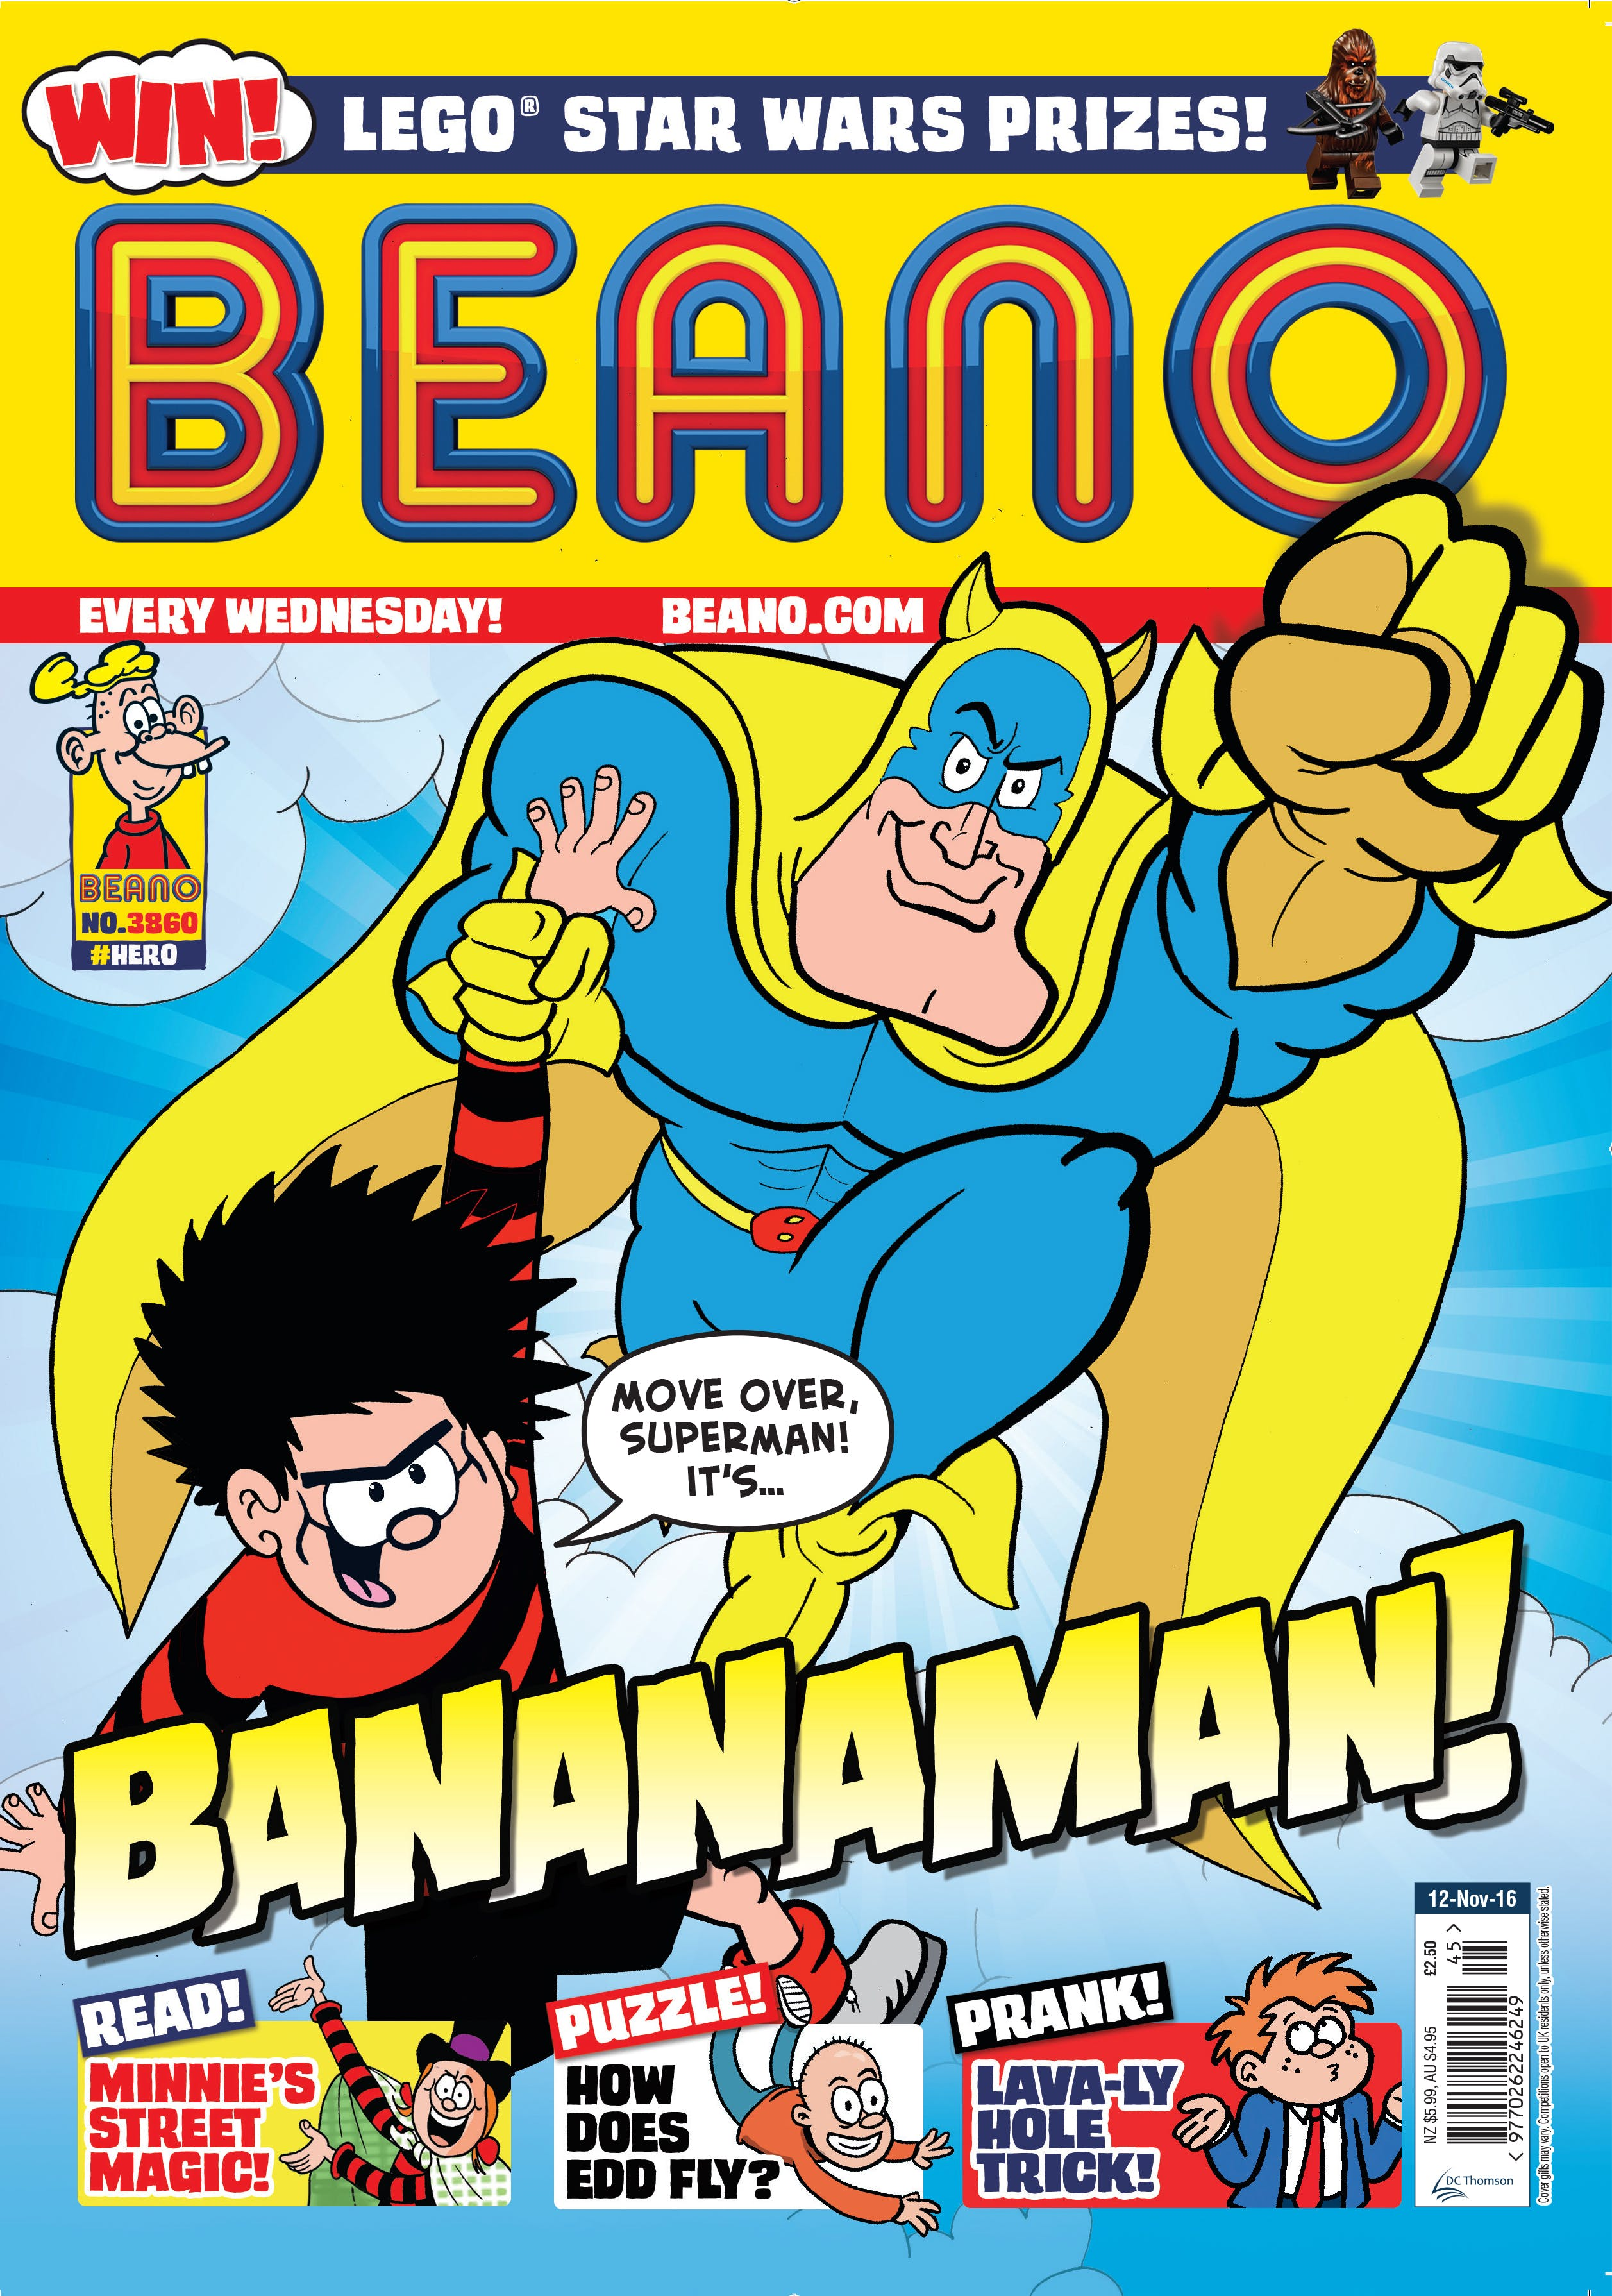 Beano Cover 9.11.16